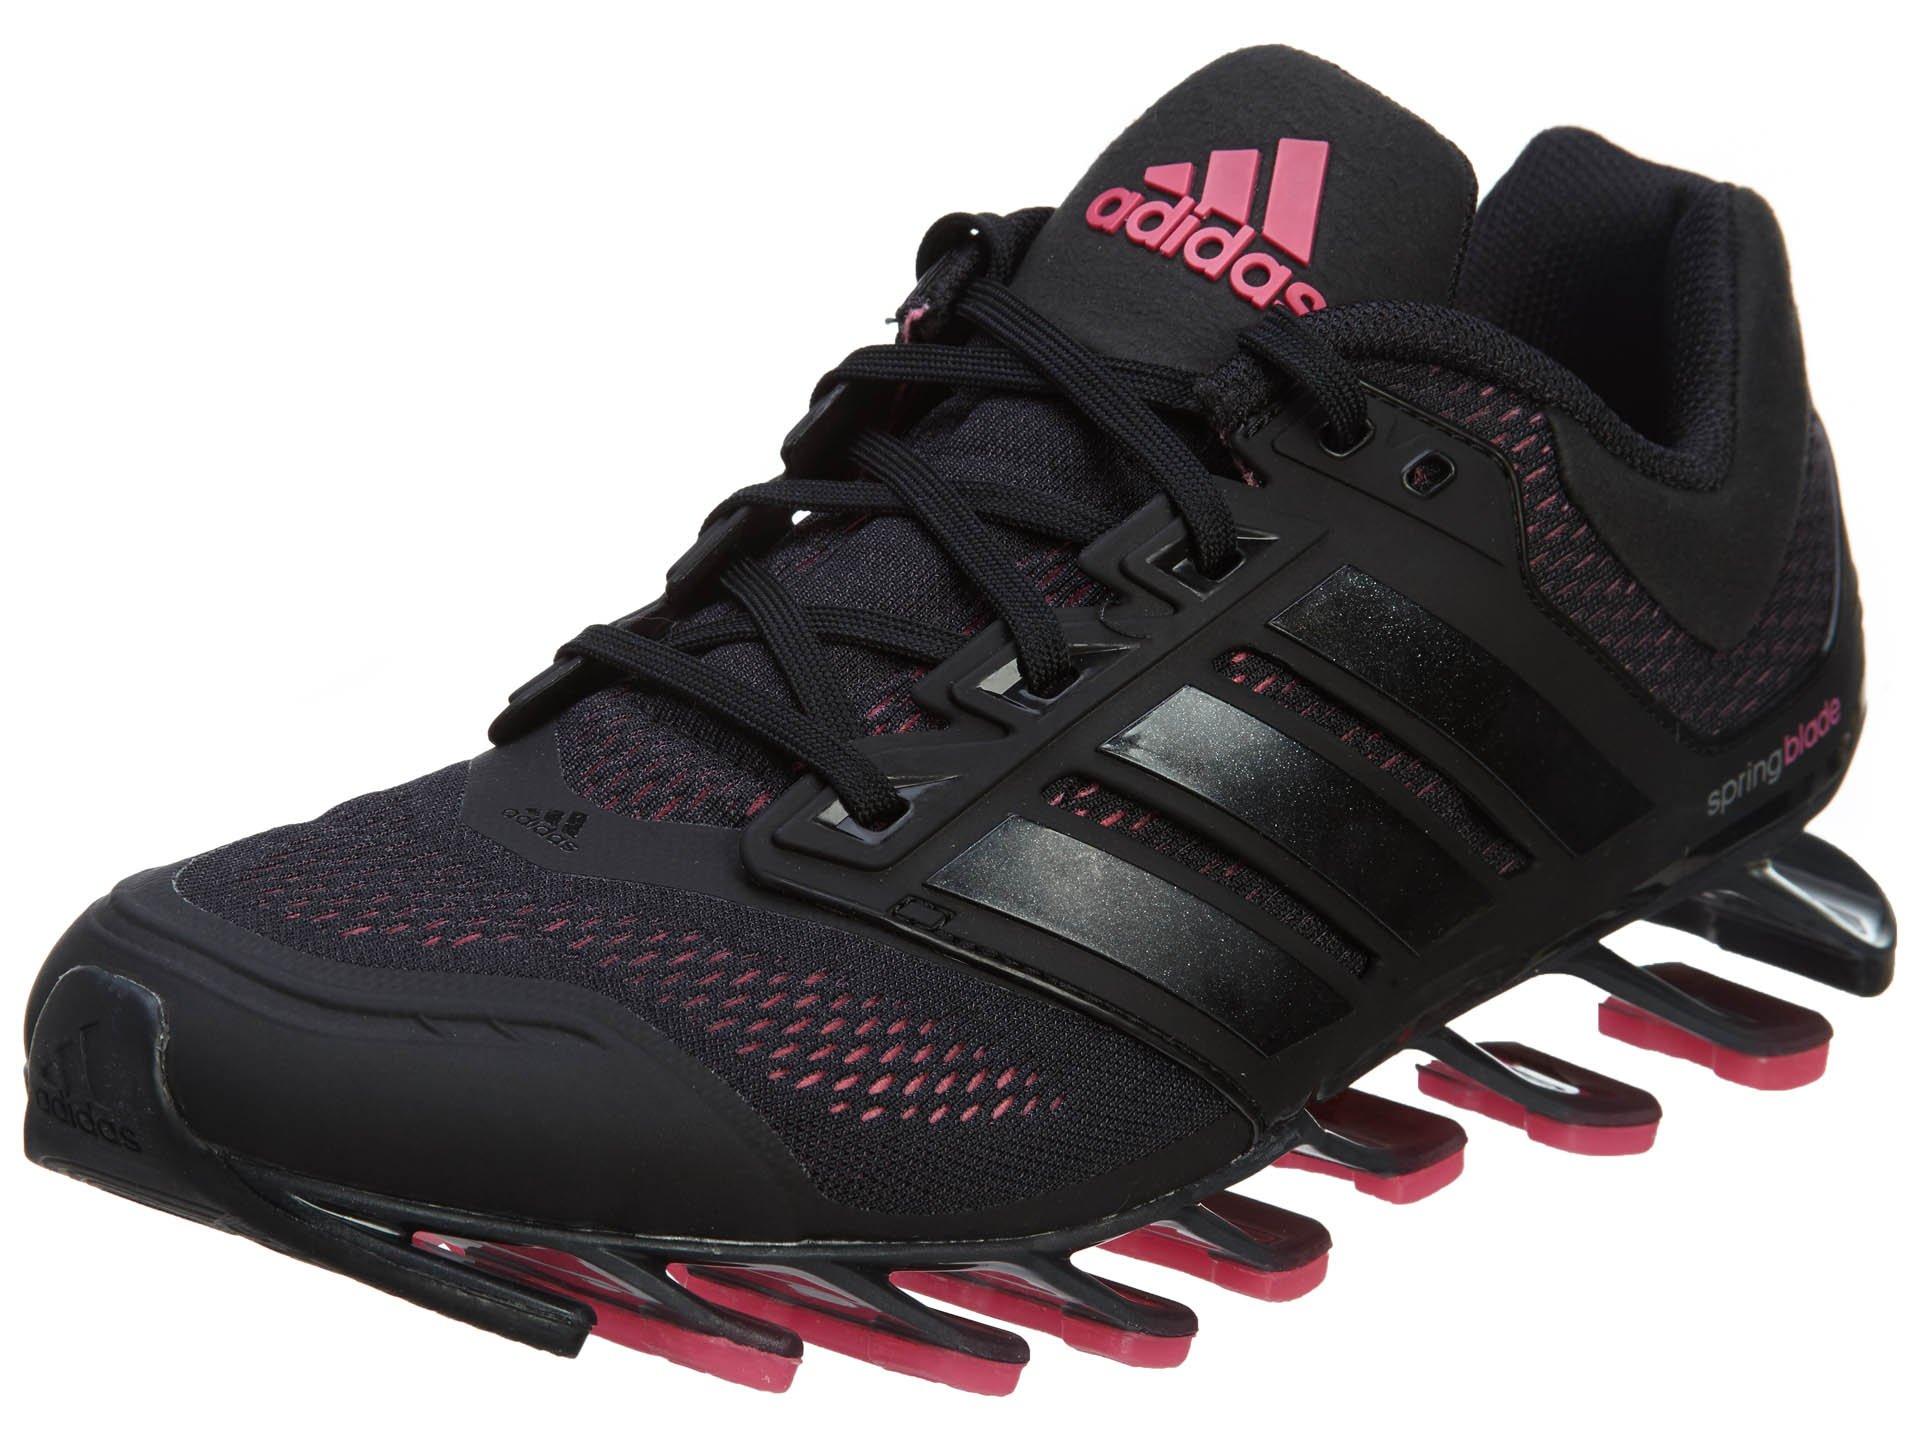 Adidas Springblade Drive Womens Style: D73958-CBLK/PNK/CBLK Size: 9